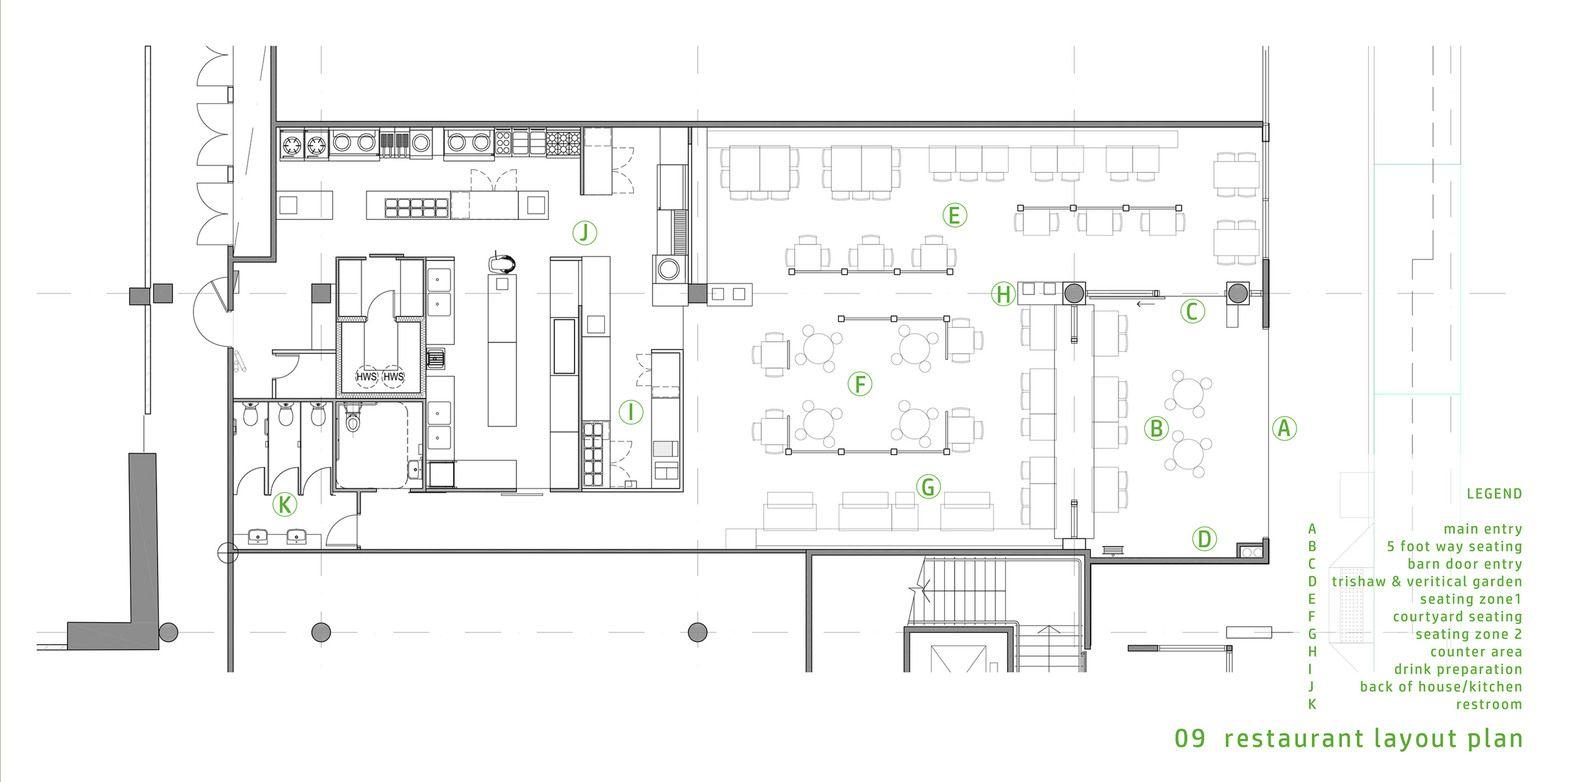 gallery makan place pneuarch 11 restaurant layout restaurant bar puff pastry [ 1582 x 782 Pixel ]